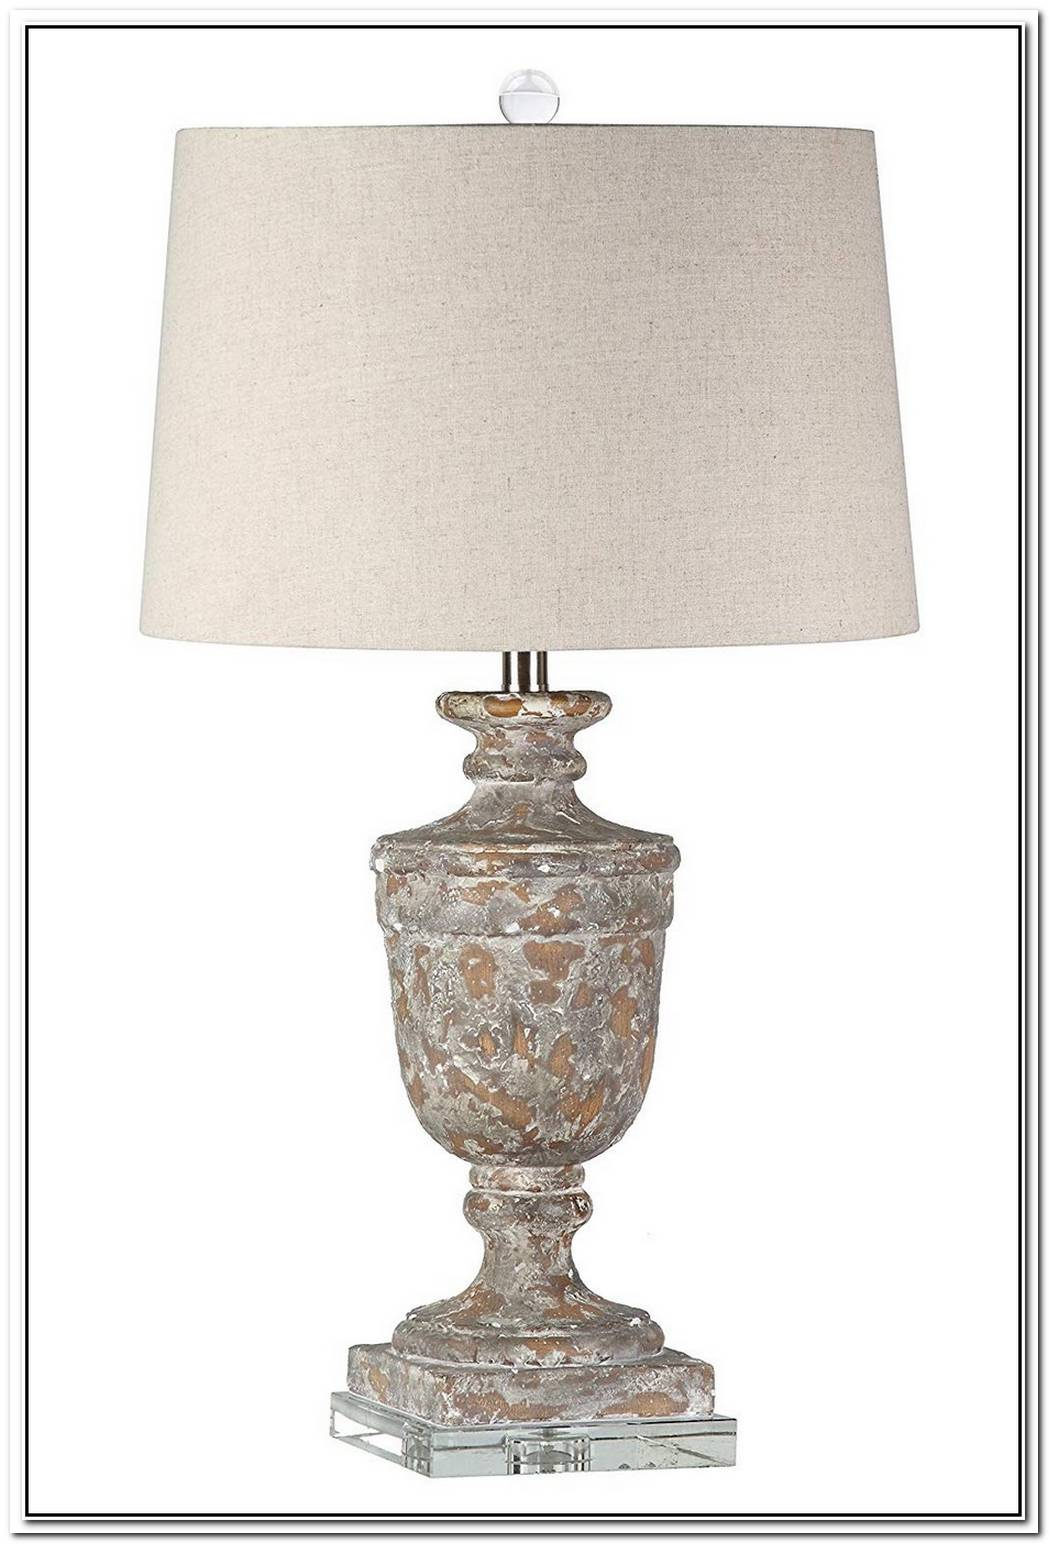 Mod Urn Table Lamp